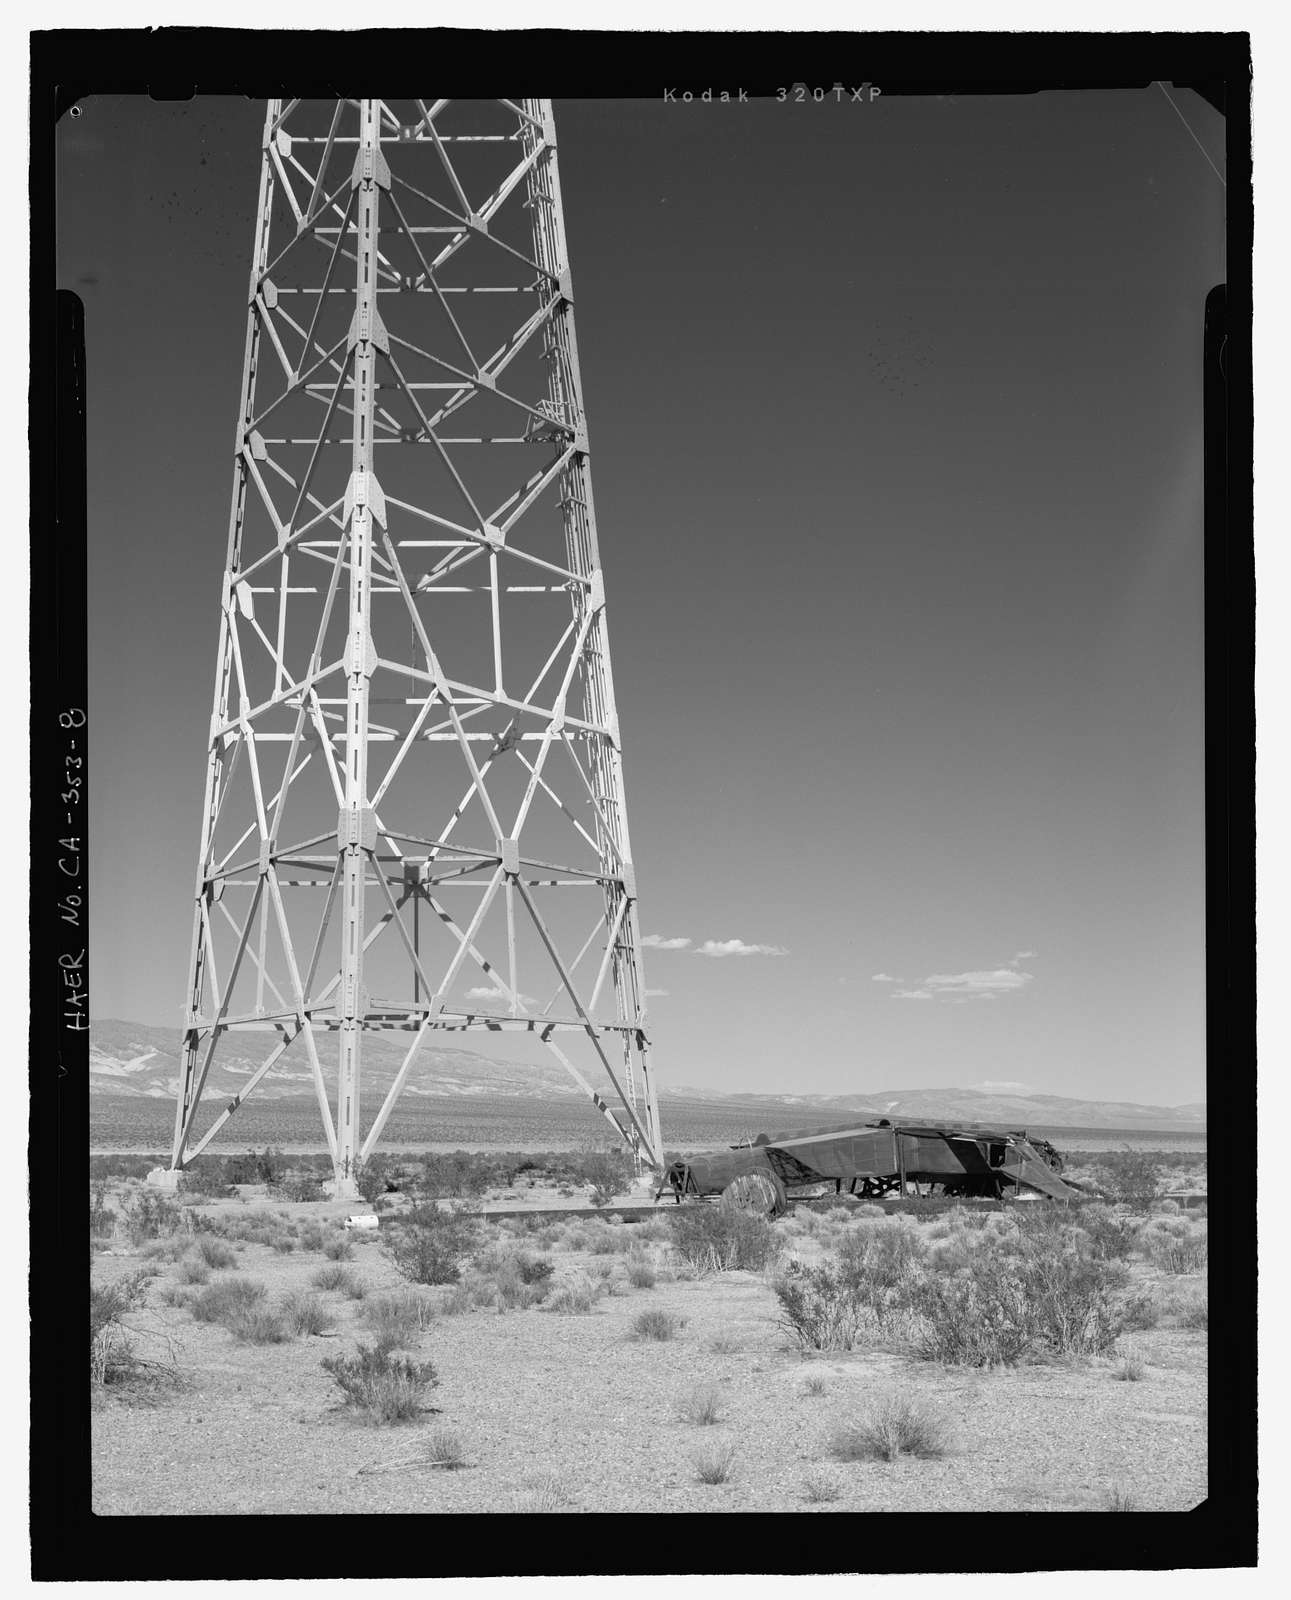 Naval Ordnance Test Station Inyokern, Randsburg Wash Facility Target Test Towers, Tower Road, China Lake, Kern County, CA